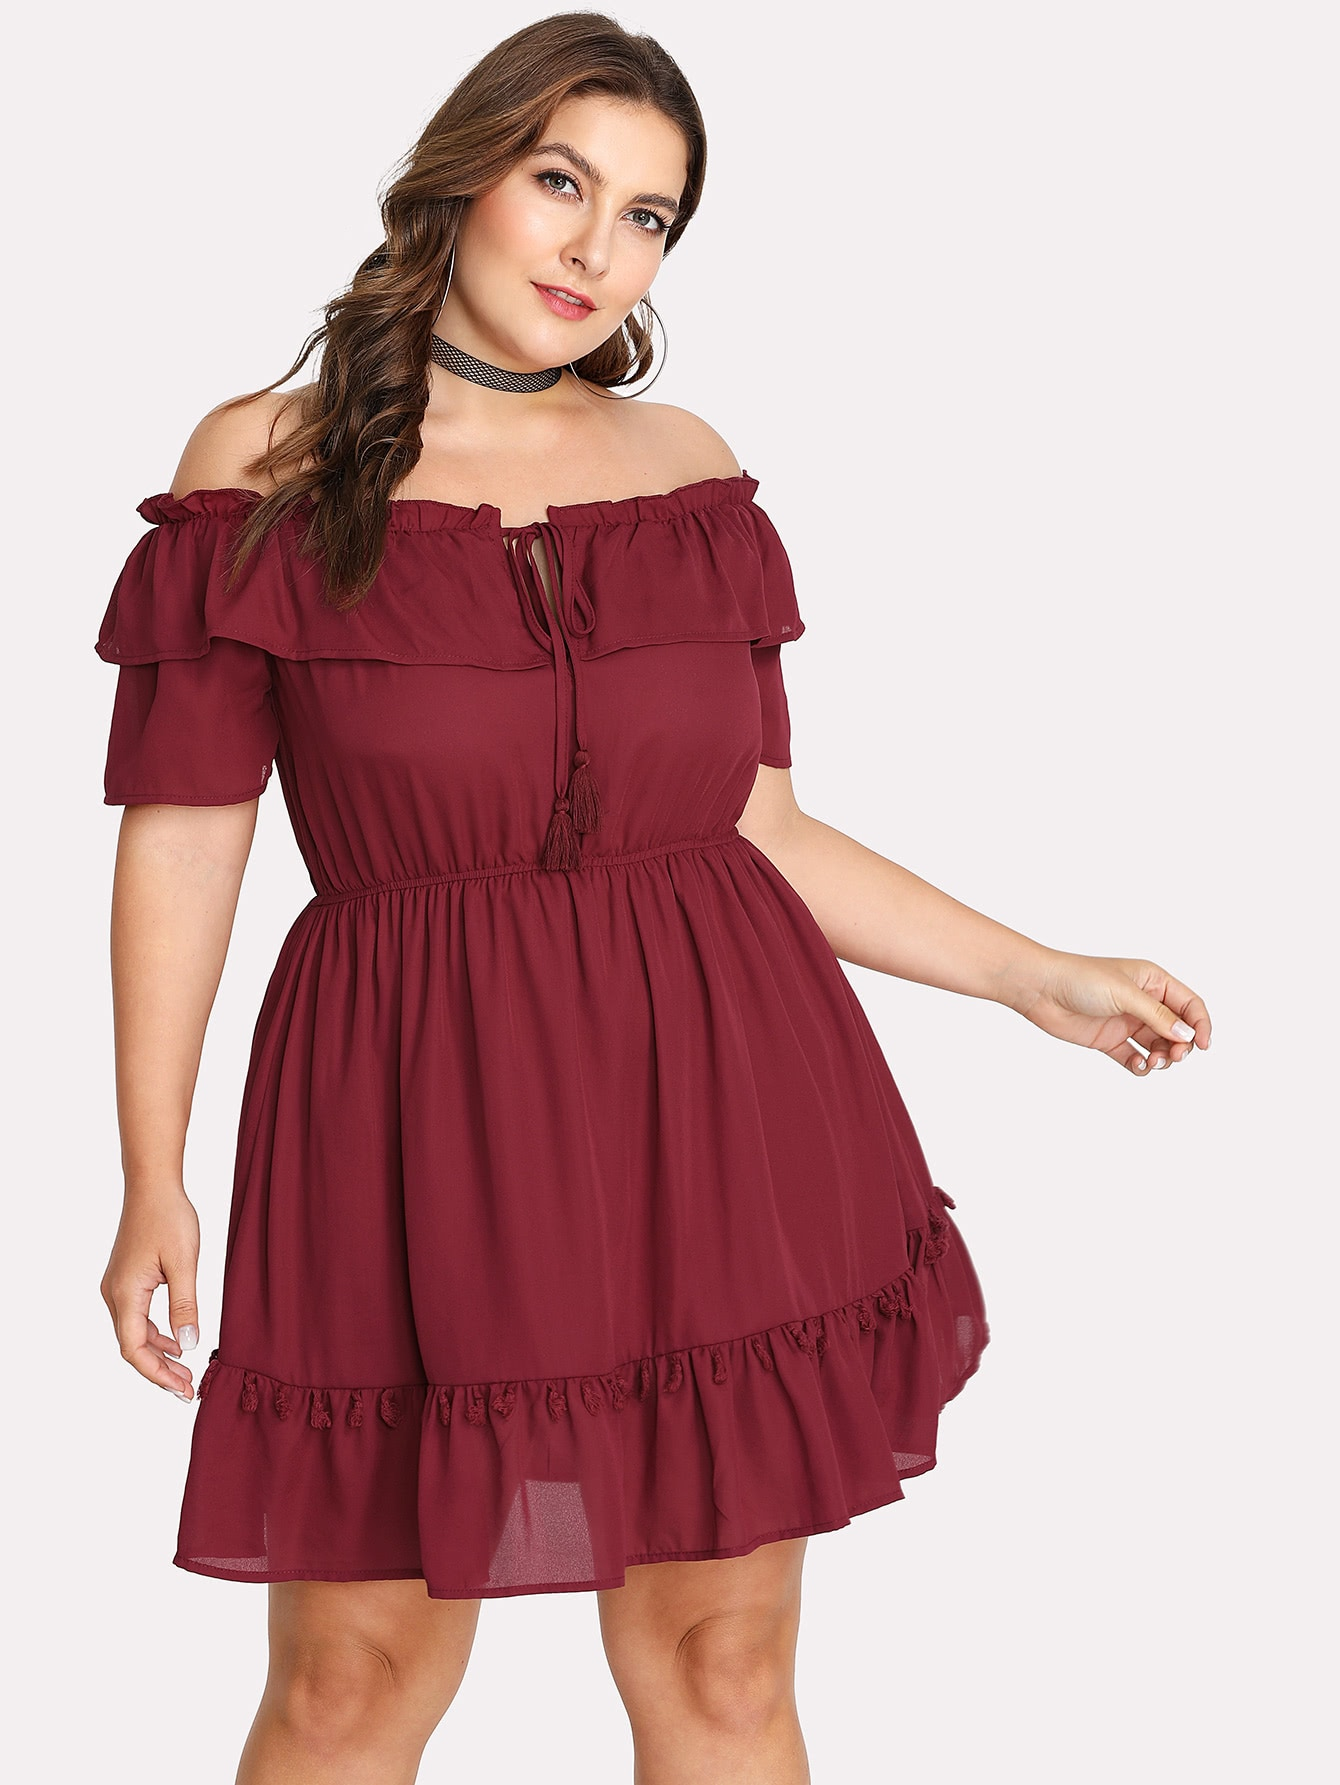 Plus Tassel Detail Ruffle Hem Tied Bardot Dress wrap front tied v back ruffle hem dress